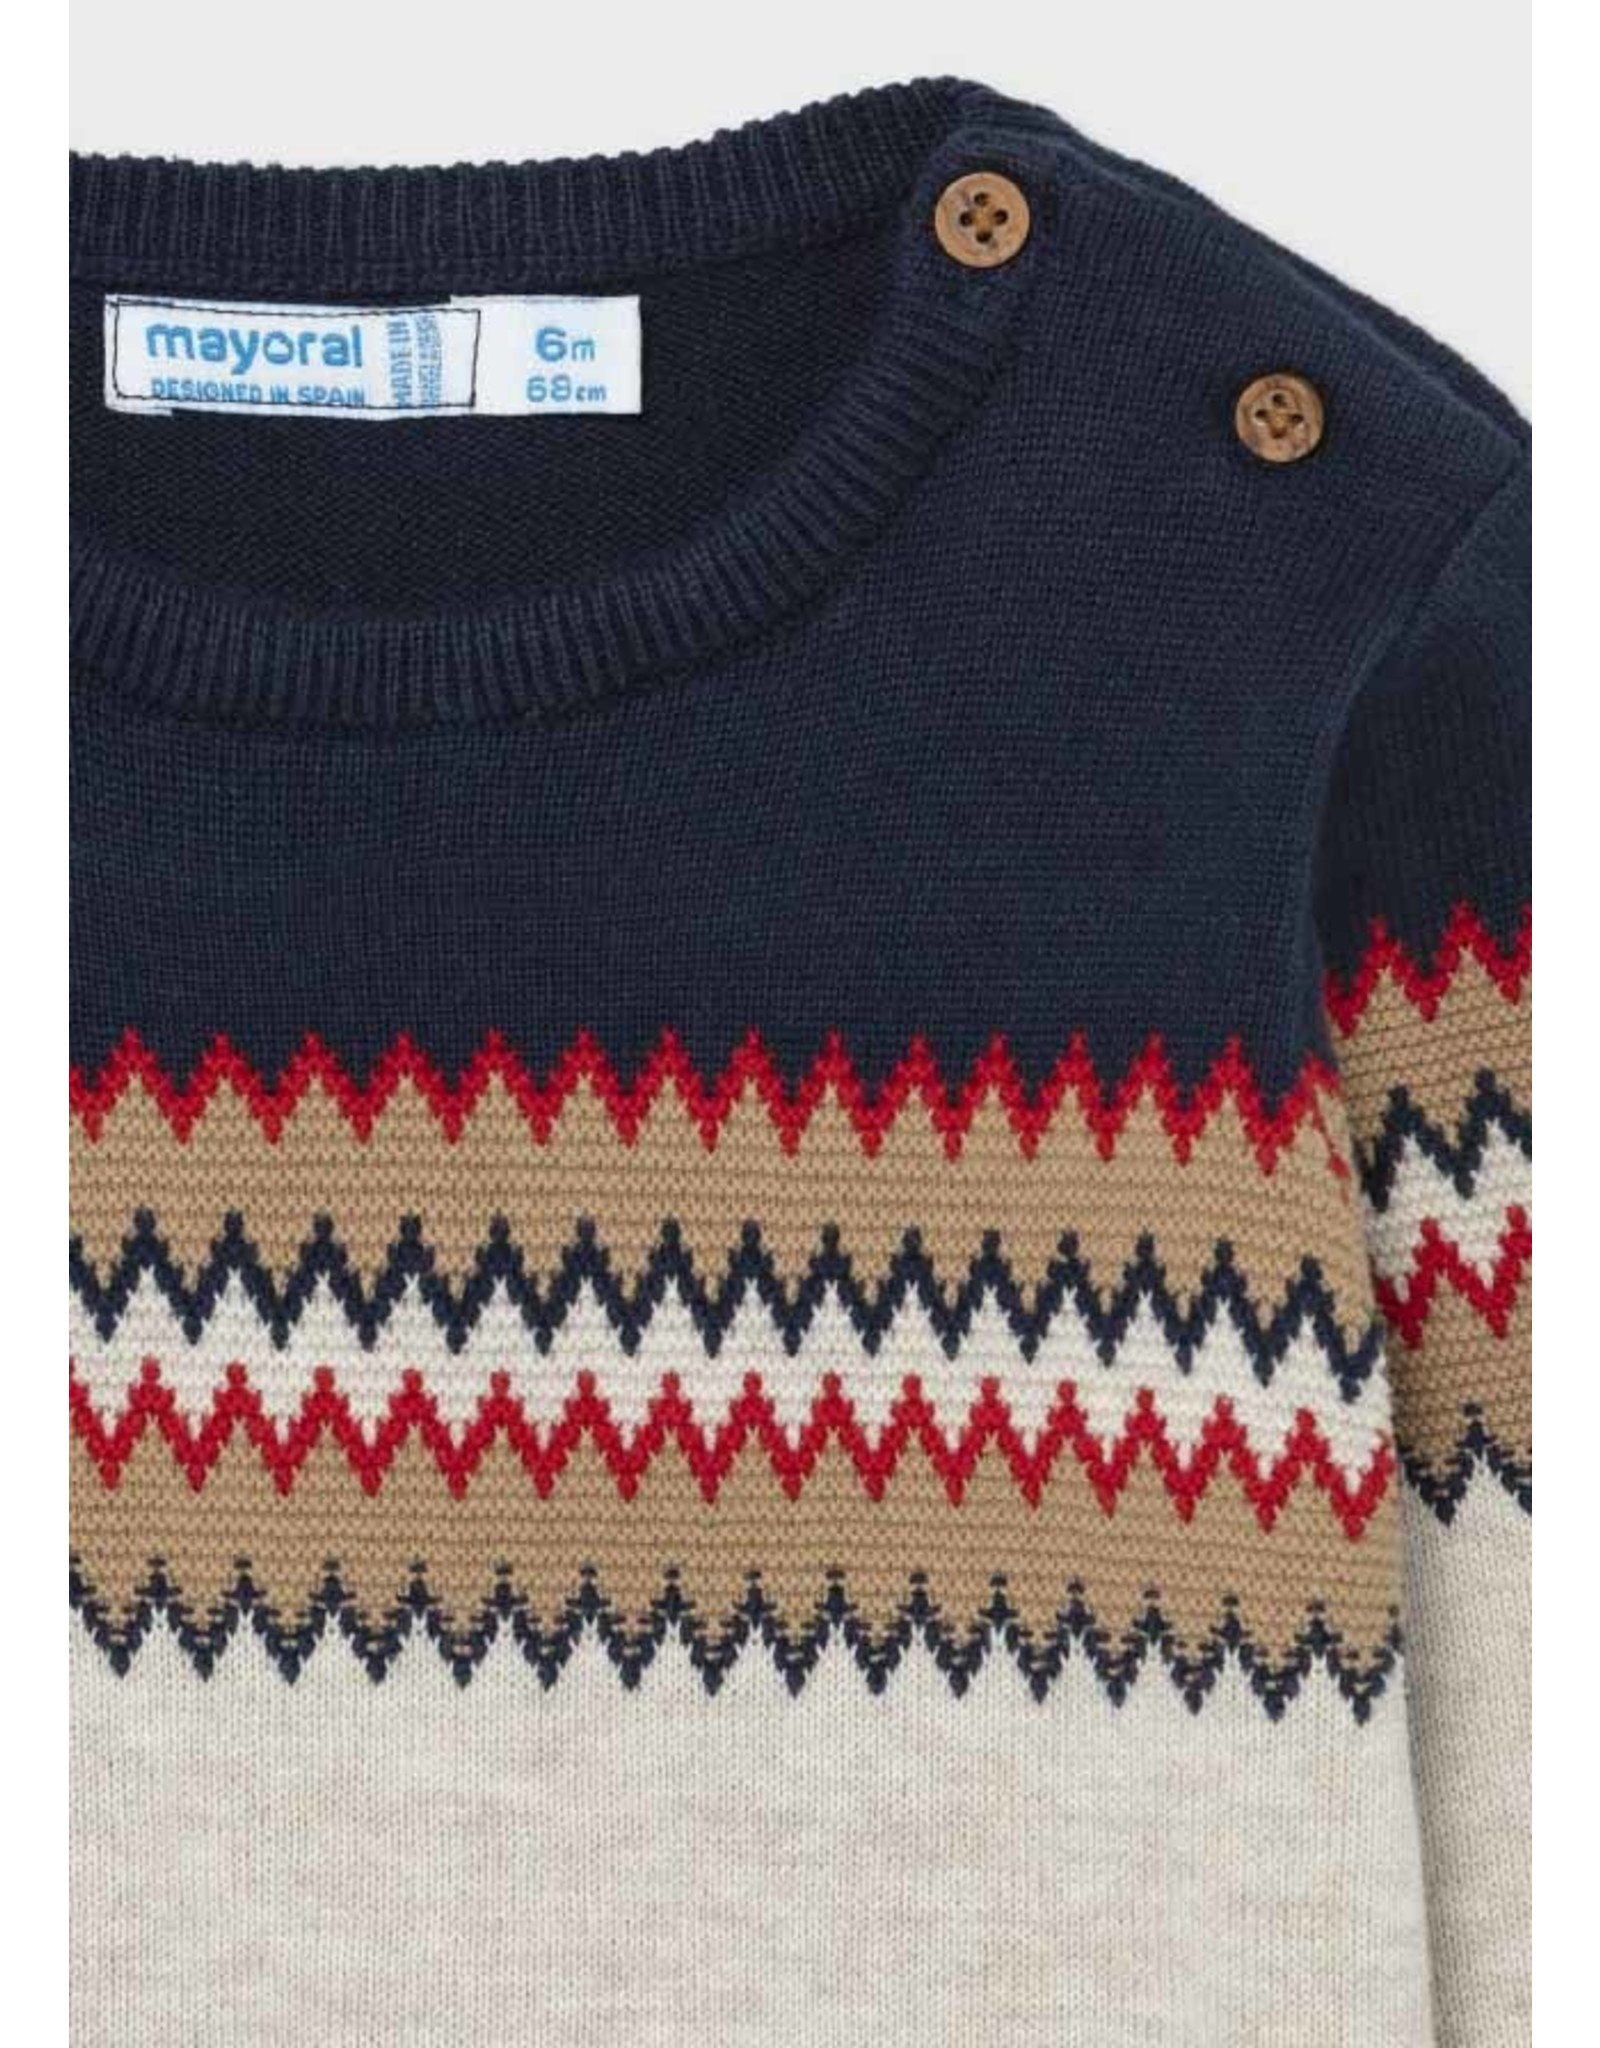 Mayoral Jagged Stripe Sweater